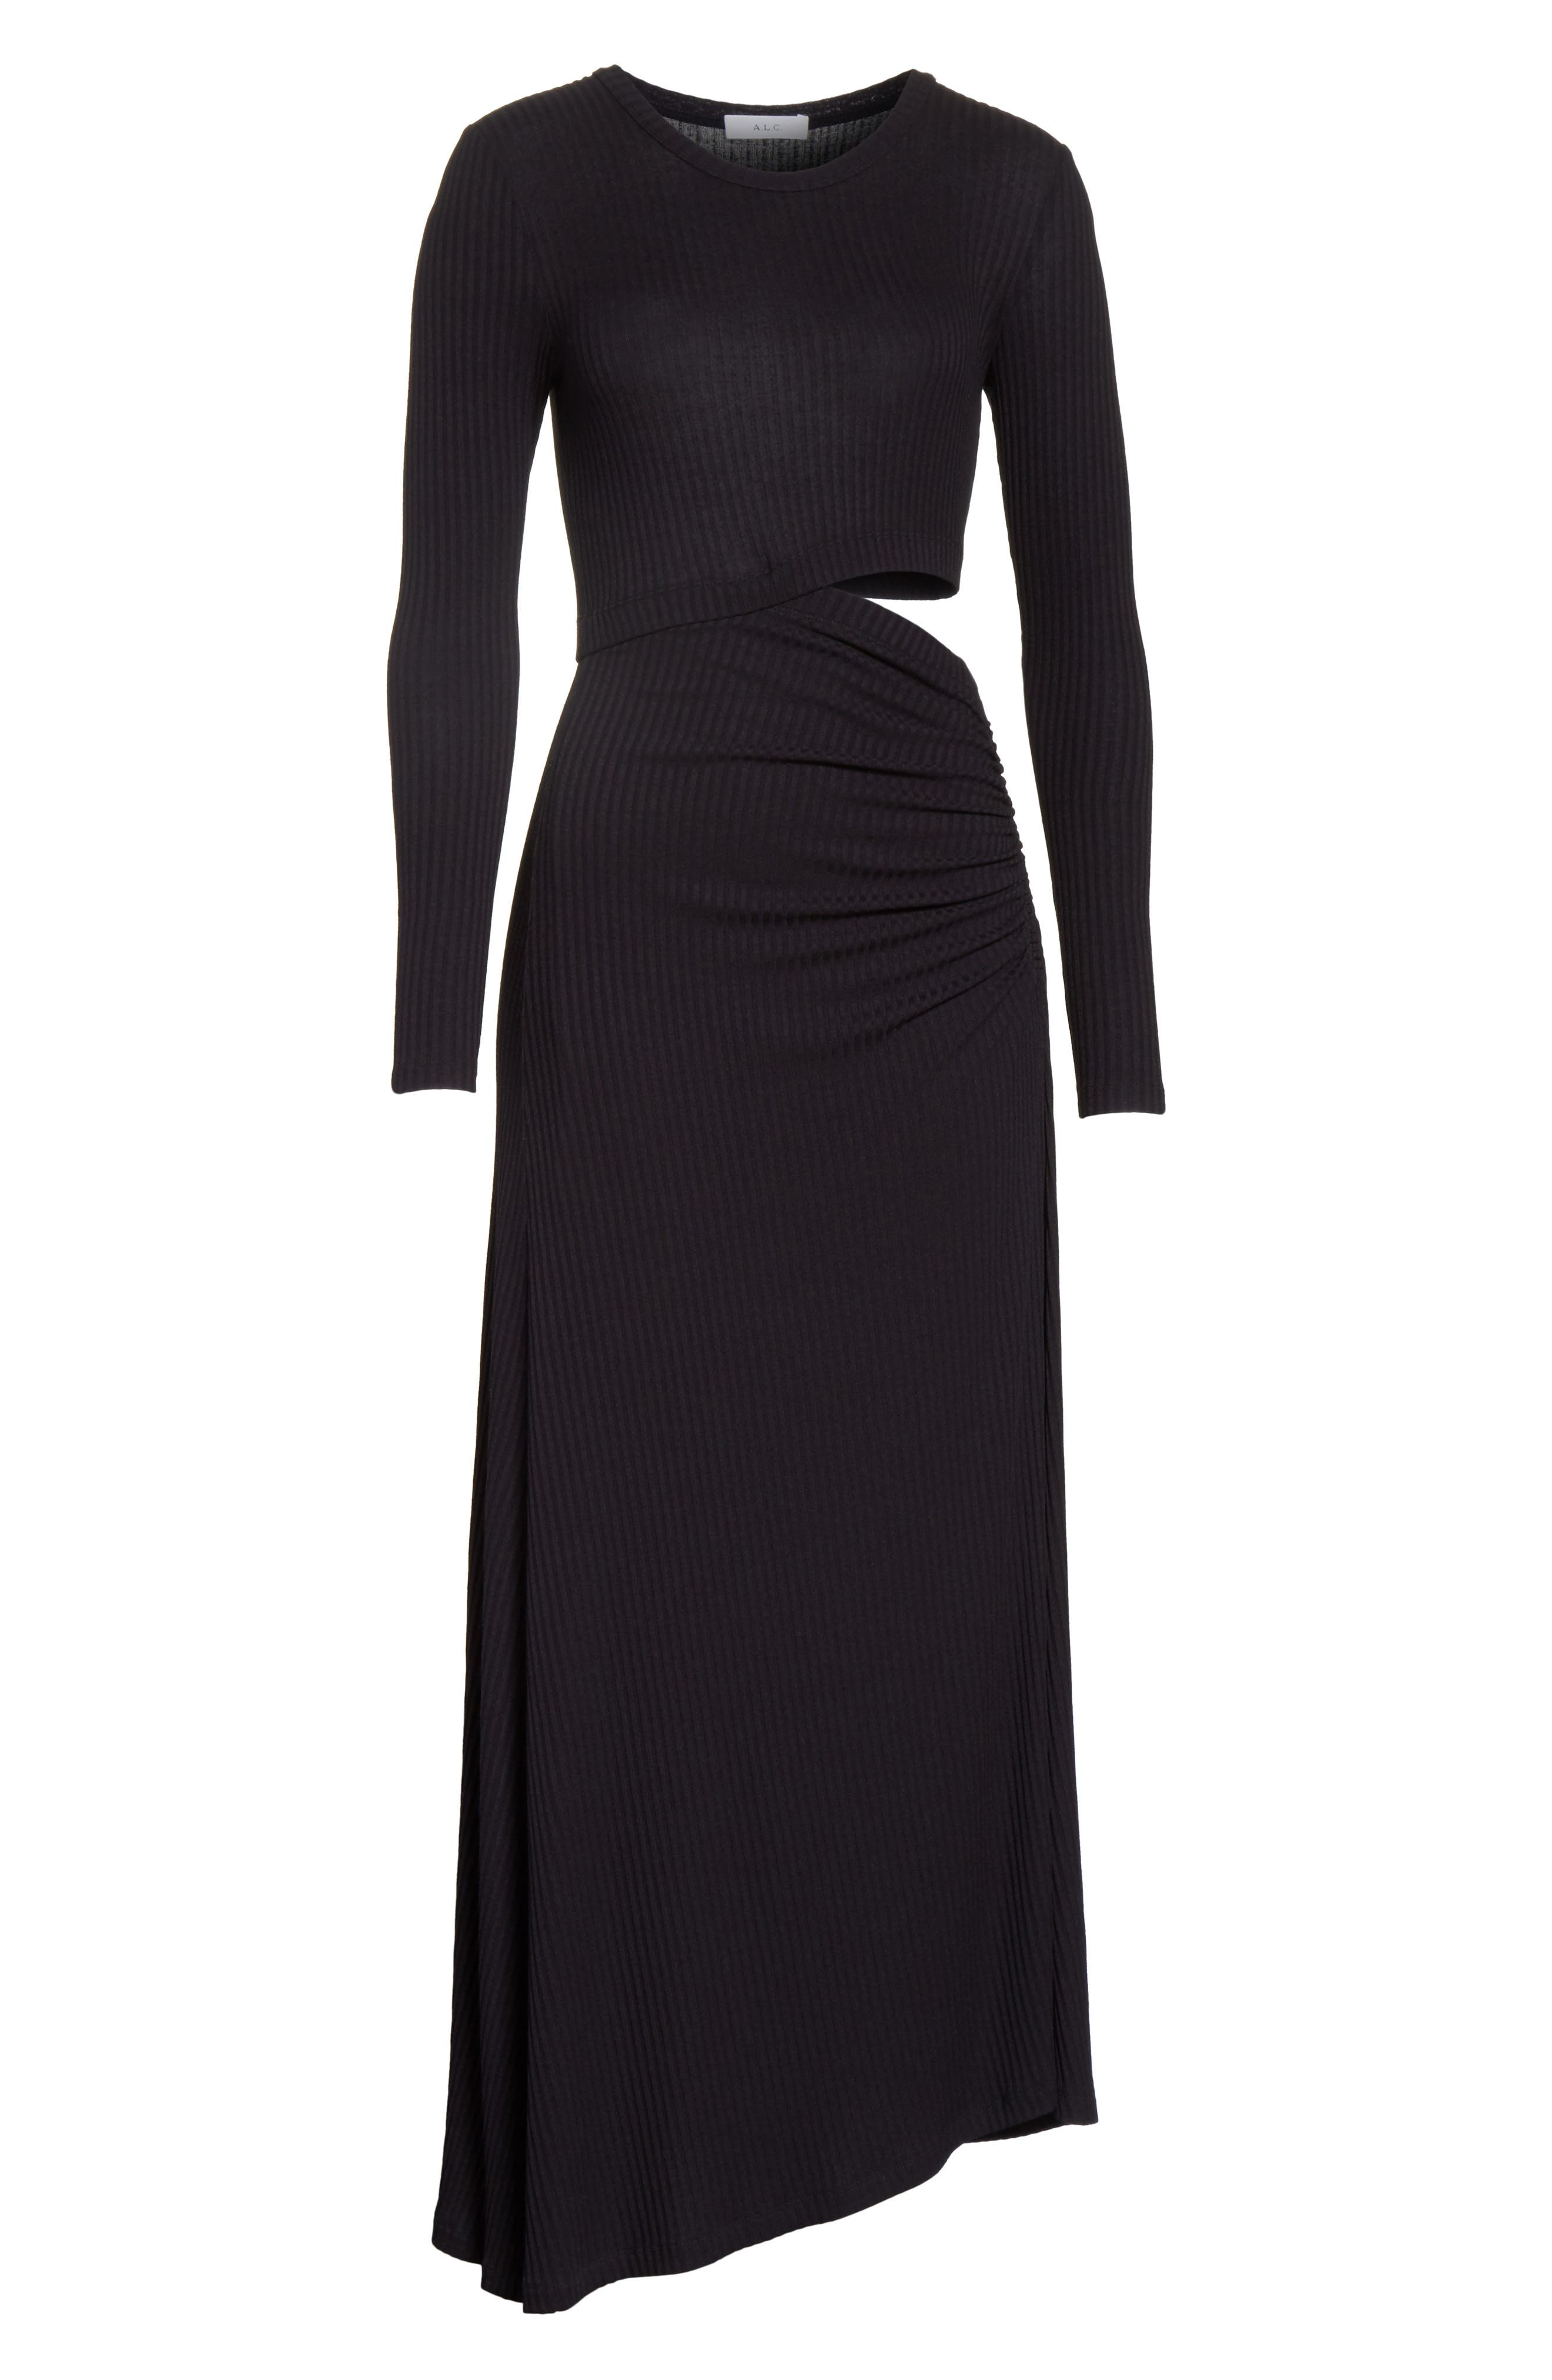 Rooney Cutout Dress,                             Alternate thumbnail 6, color,                             Black